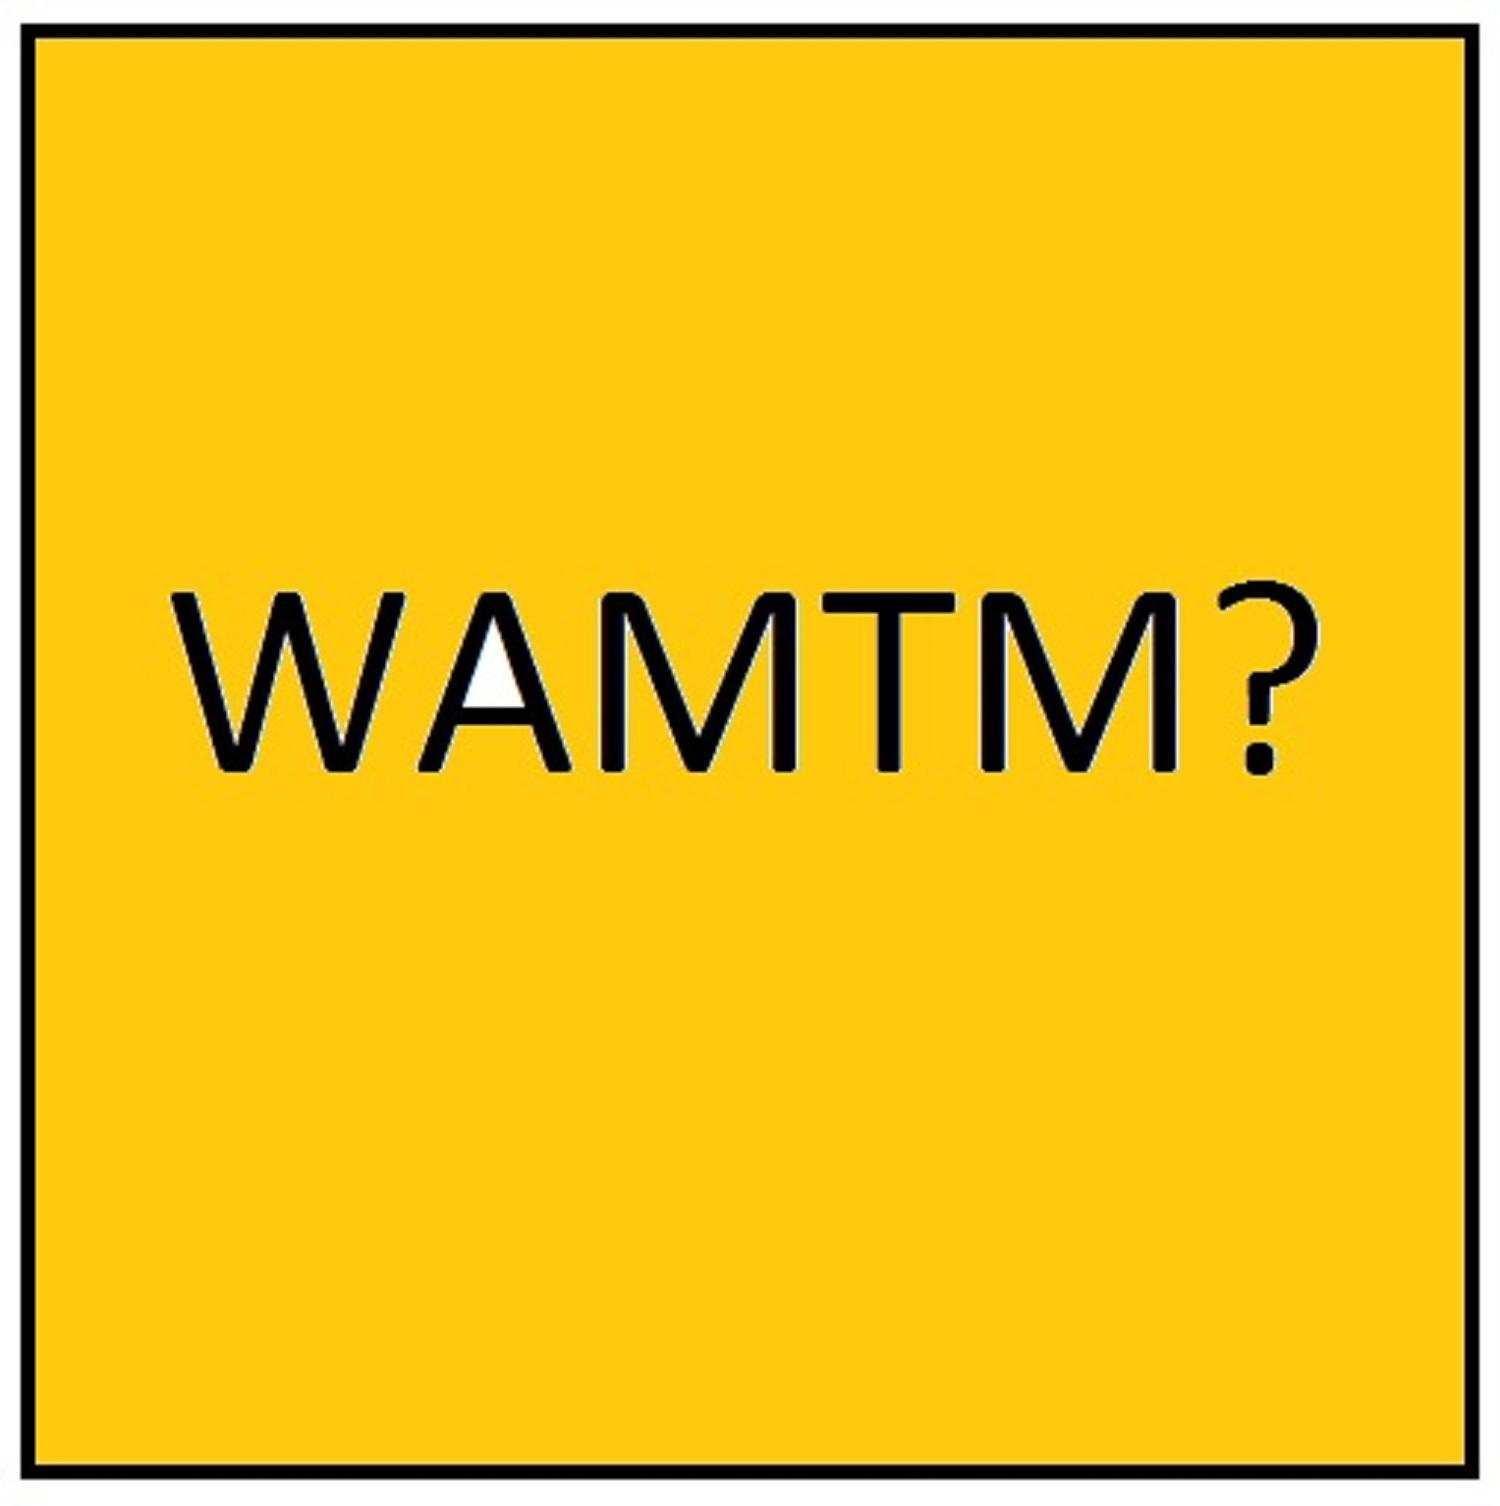 WAMTM - Philosophical Leopard